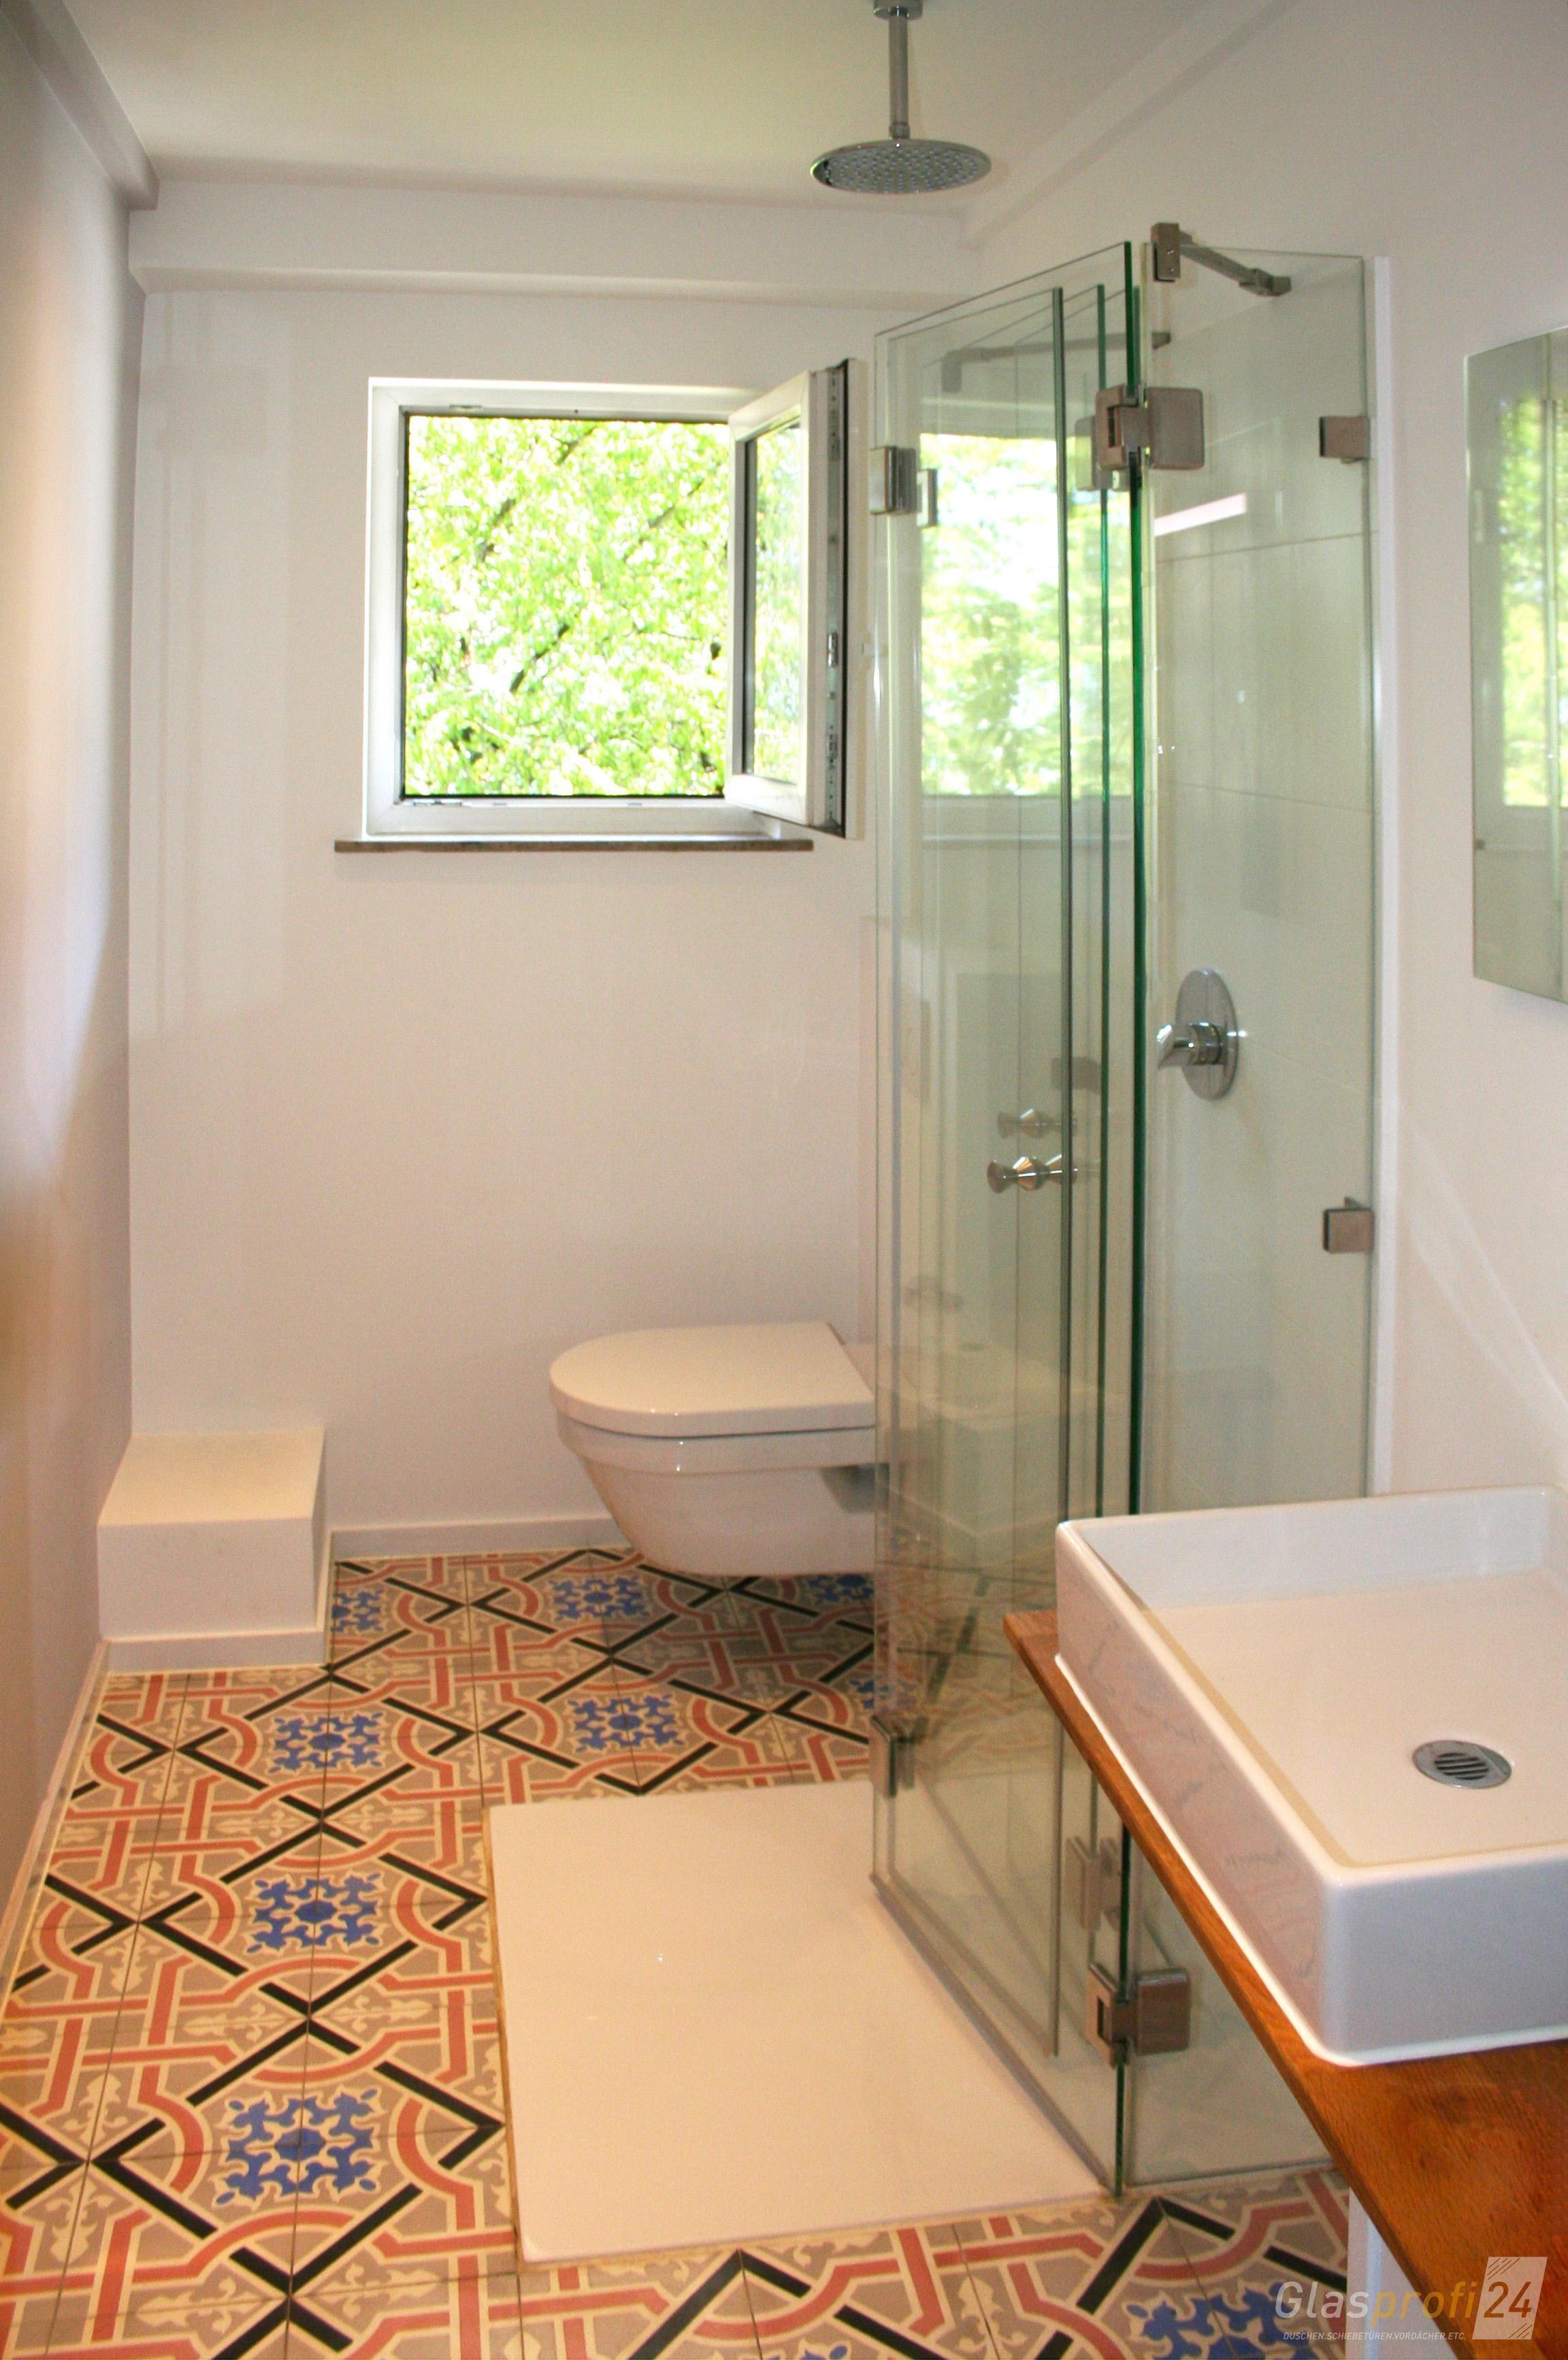 20 design ideas for small bathrooms that look perfect on bathroom renovation ideas diy id=71931